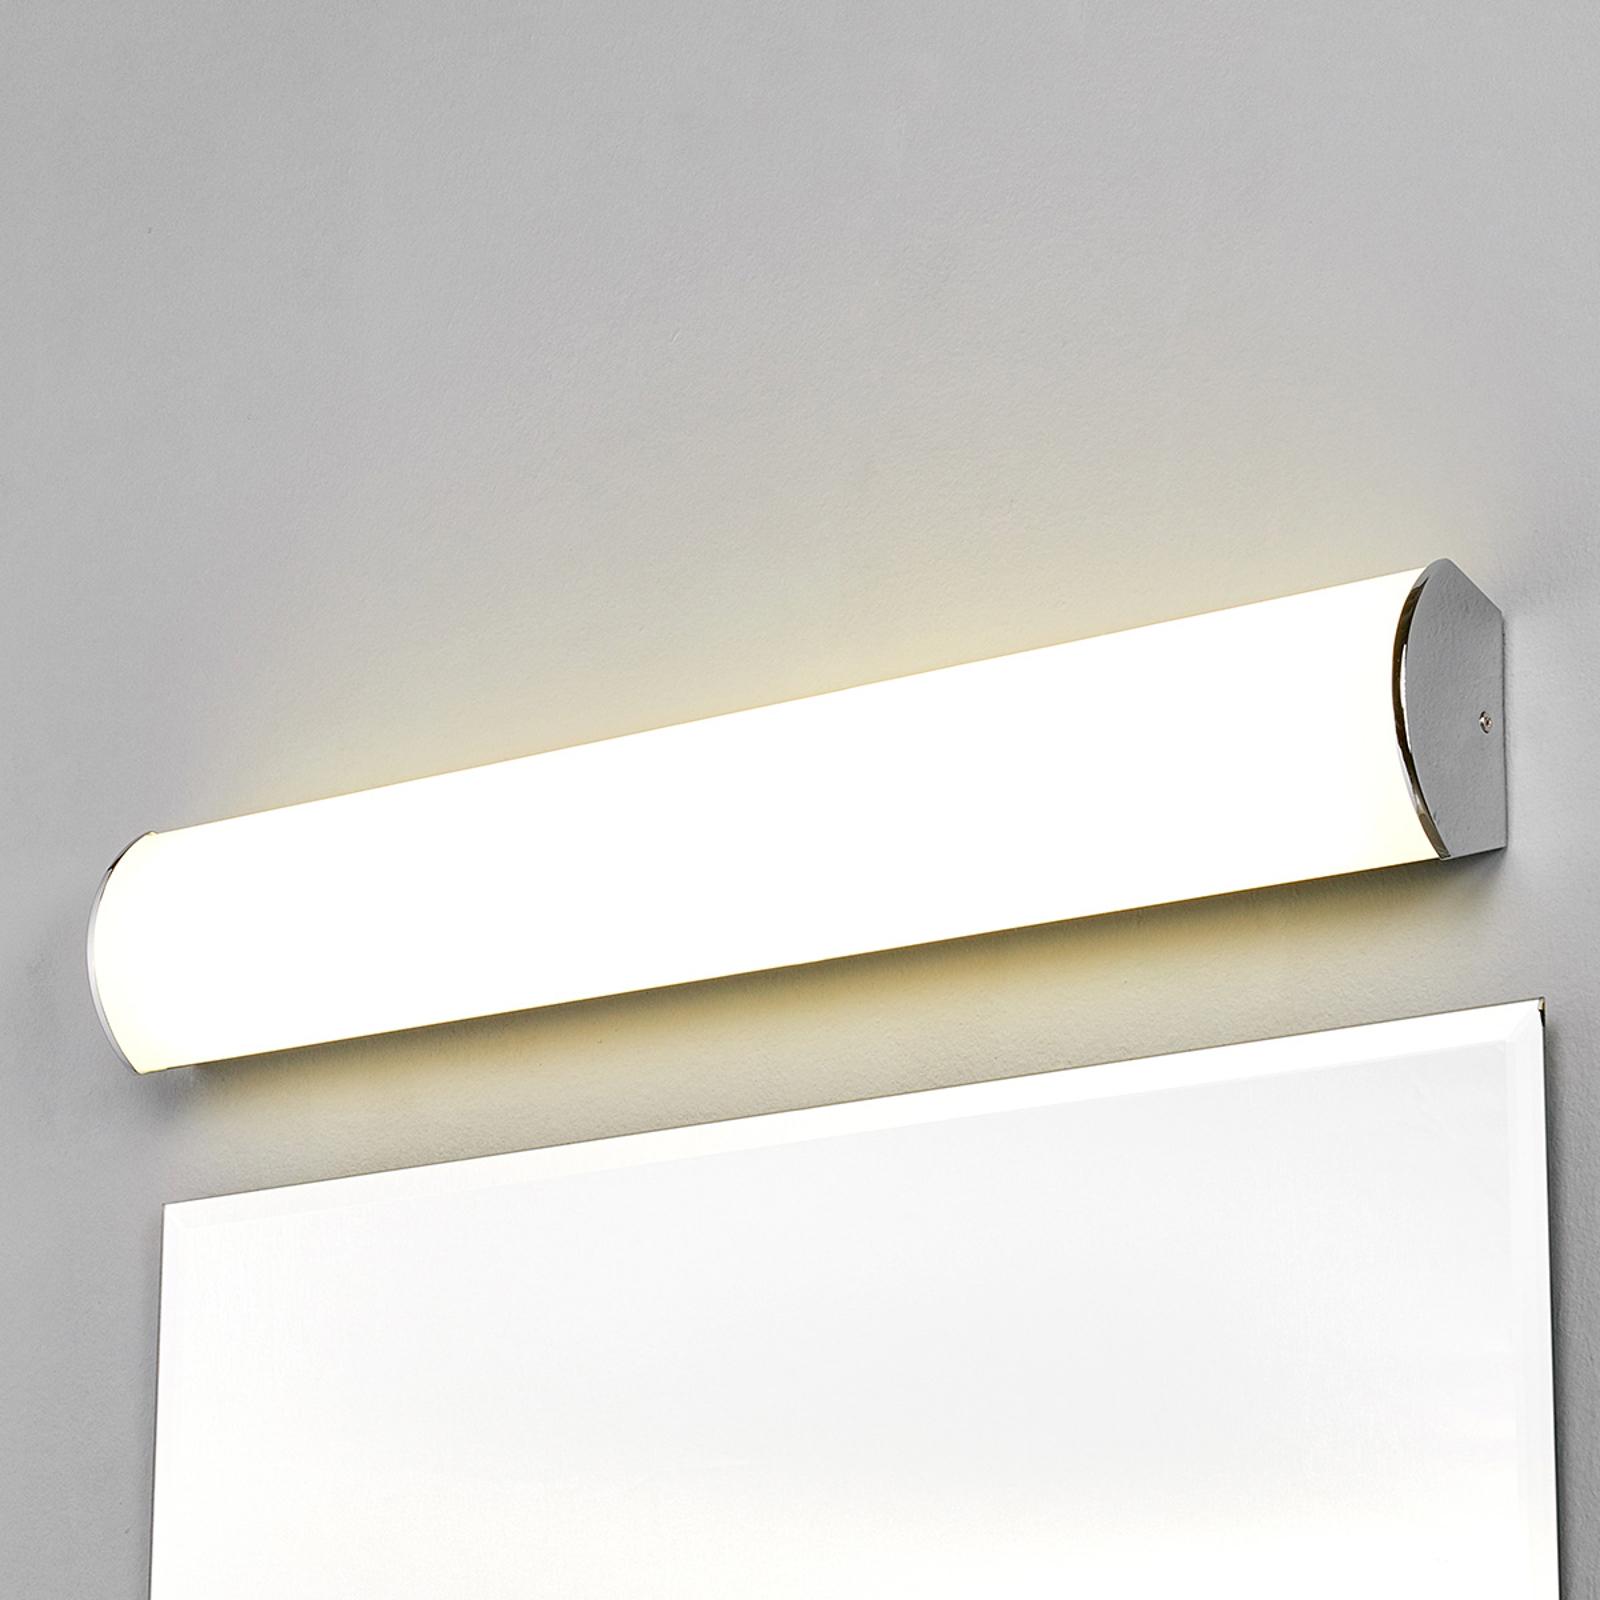 LED-Wandleuchte Elanur fürs Badezimmer